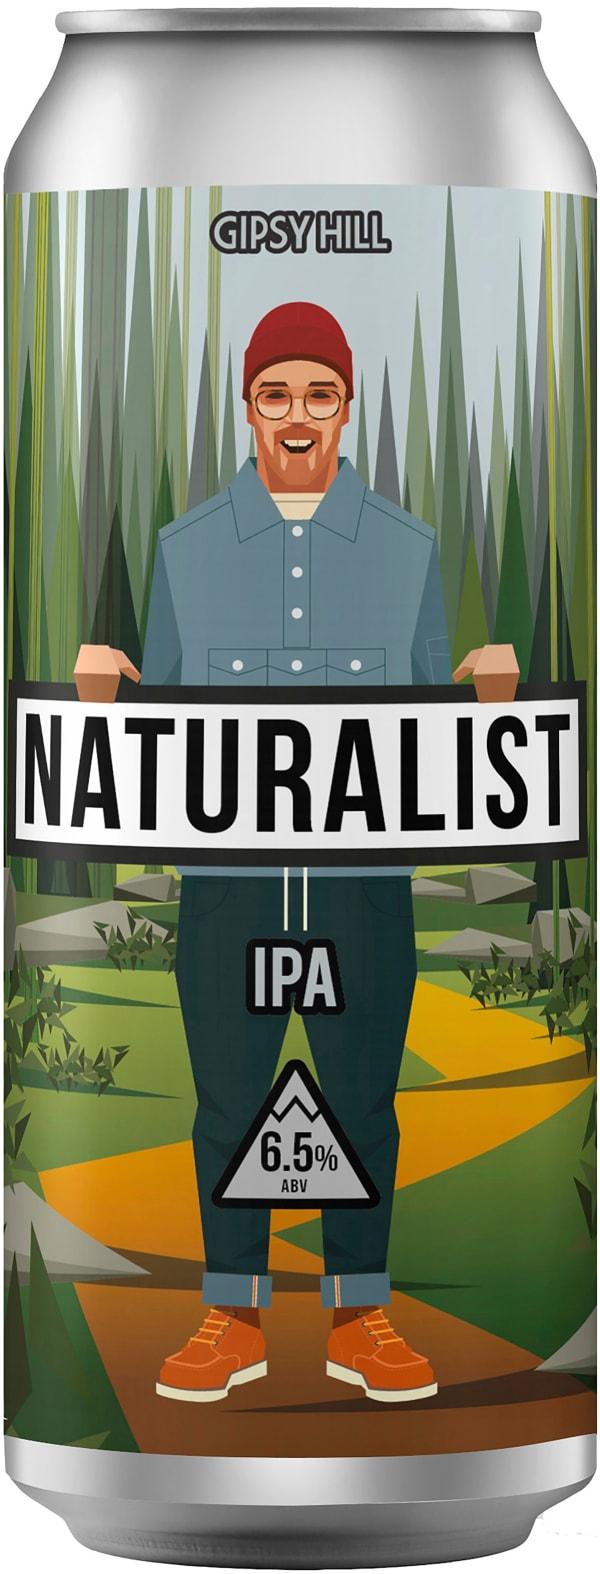 Gipsy Hill Naturalist IPA burk